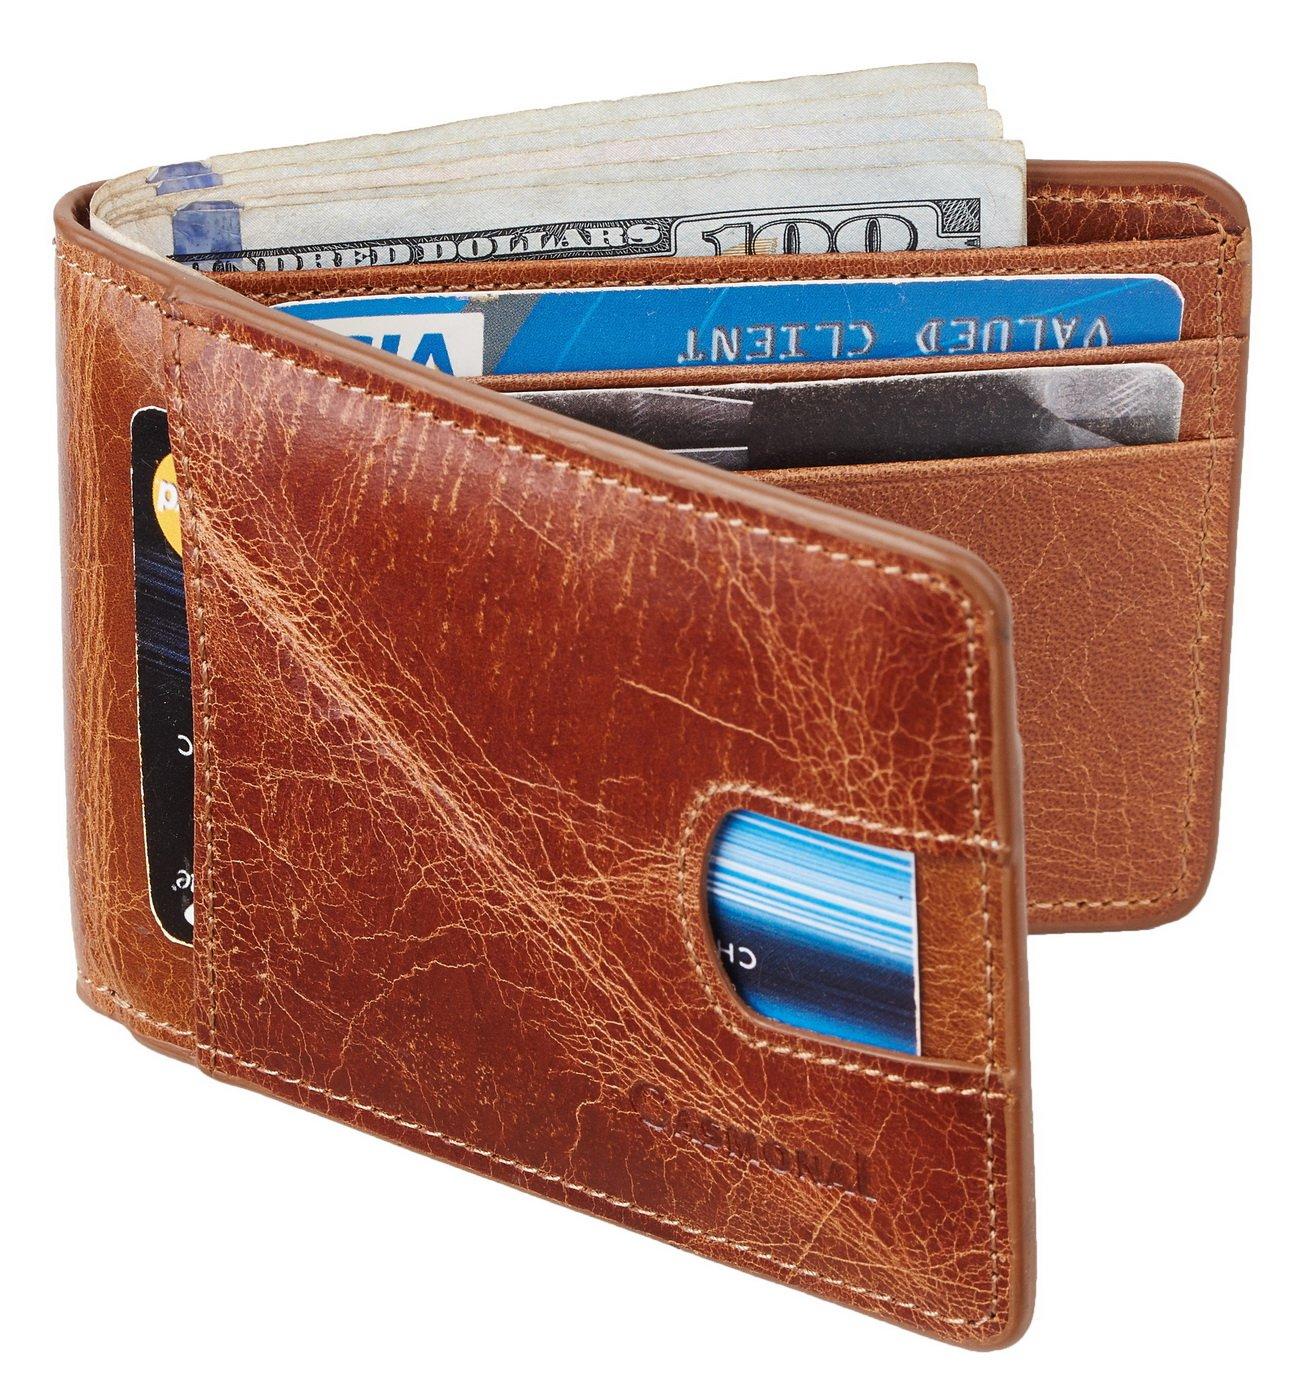 Casmonal Mens Leather Wallet Slim Front Pocket Wallet Billfold RFID Blocking (vintage brown)